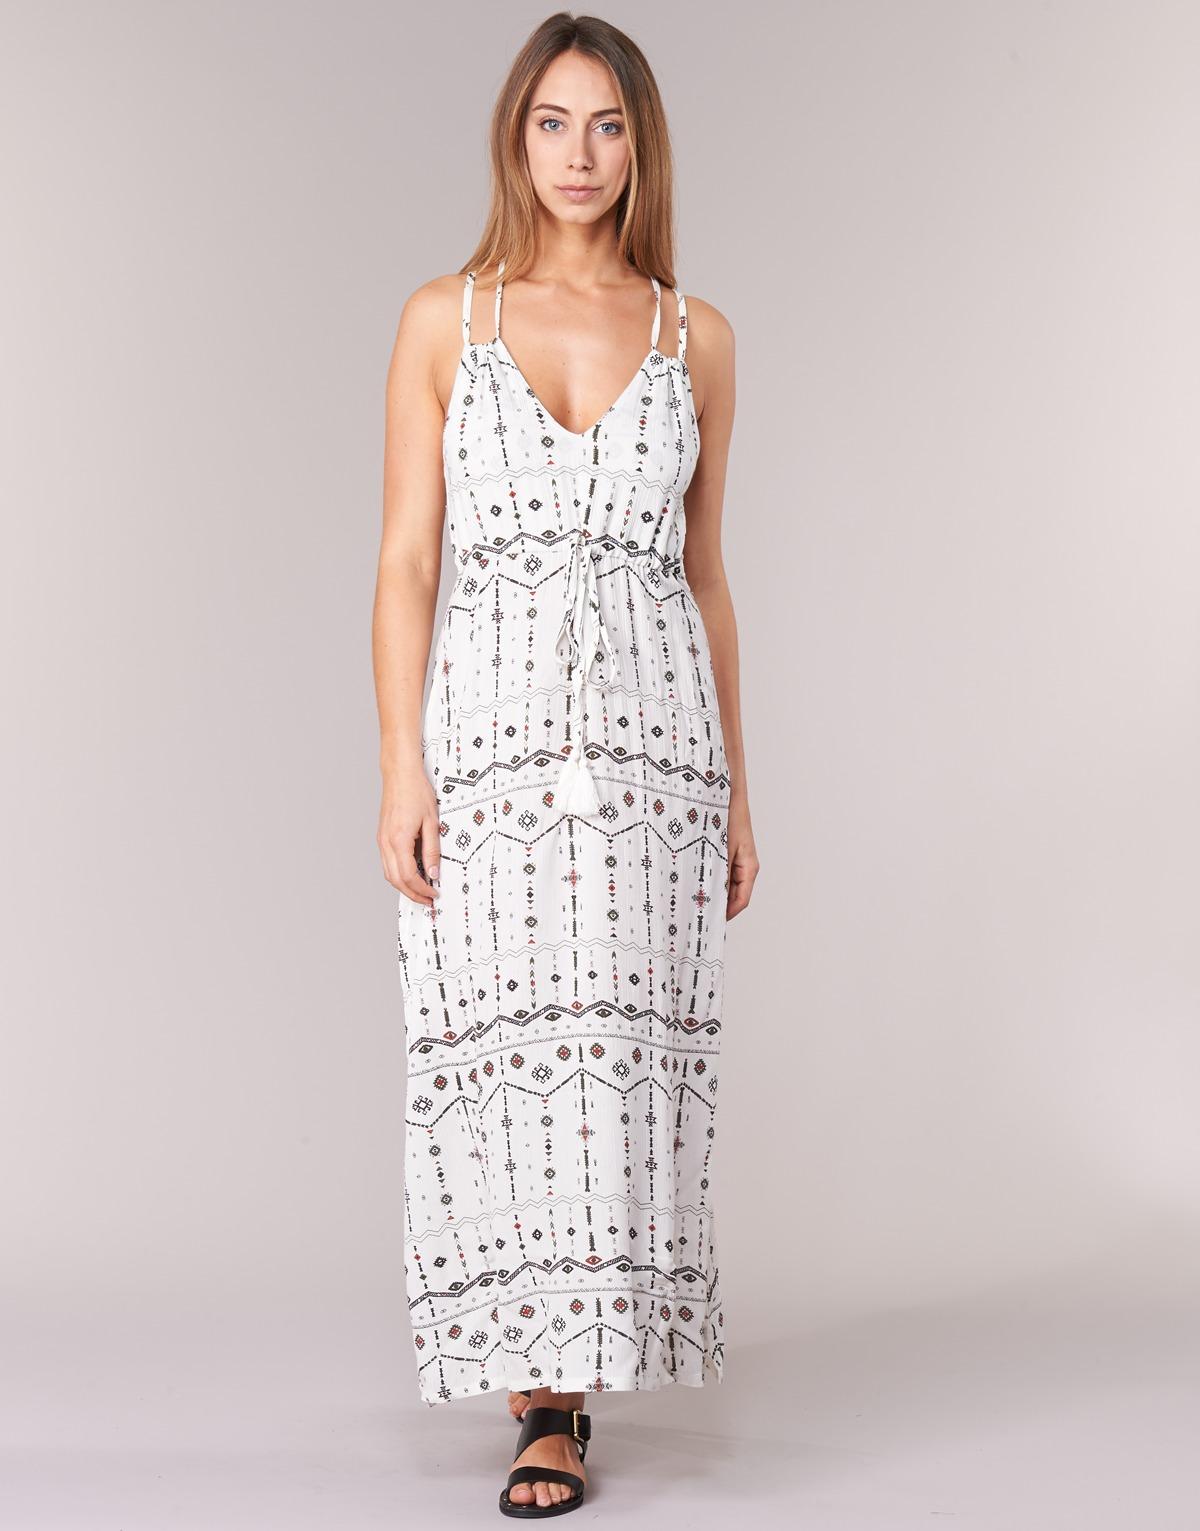 086a1cd392f8 Μακριά Φορέματα Billabong HAVE SUN Σύνθεση  Βισκόζη